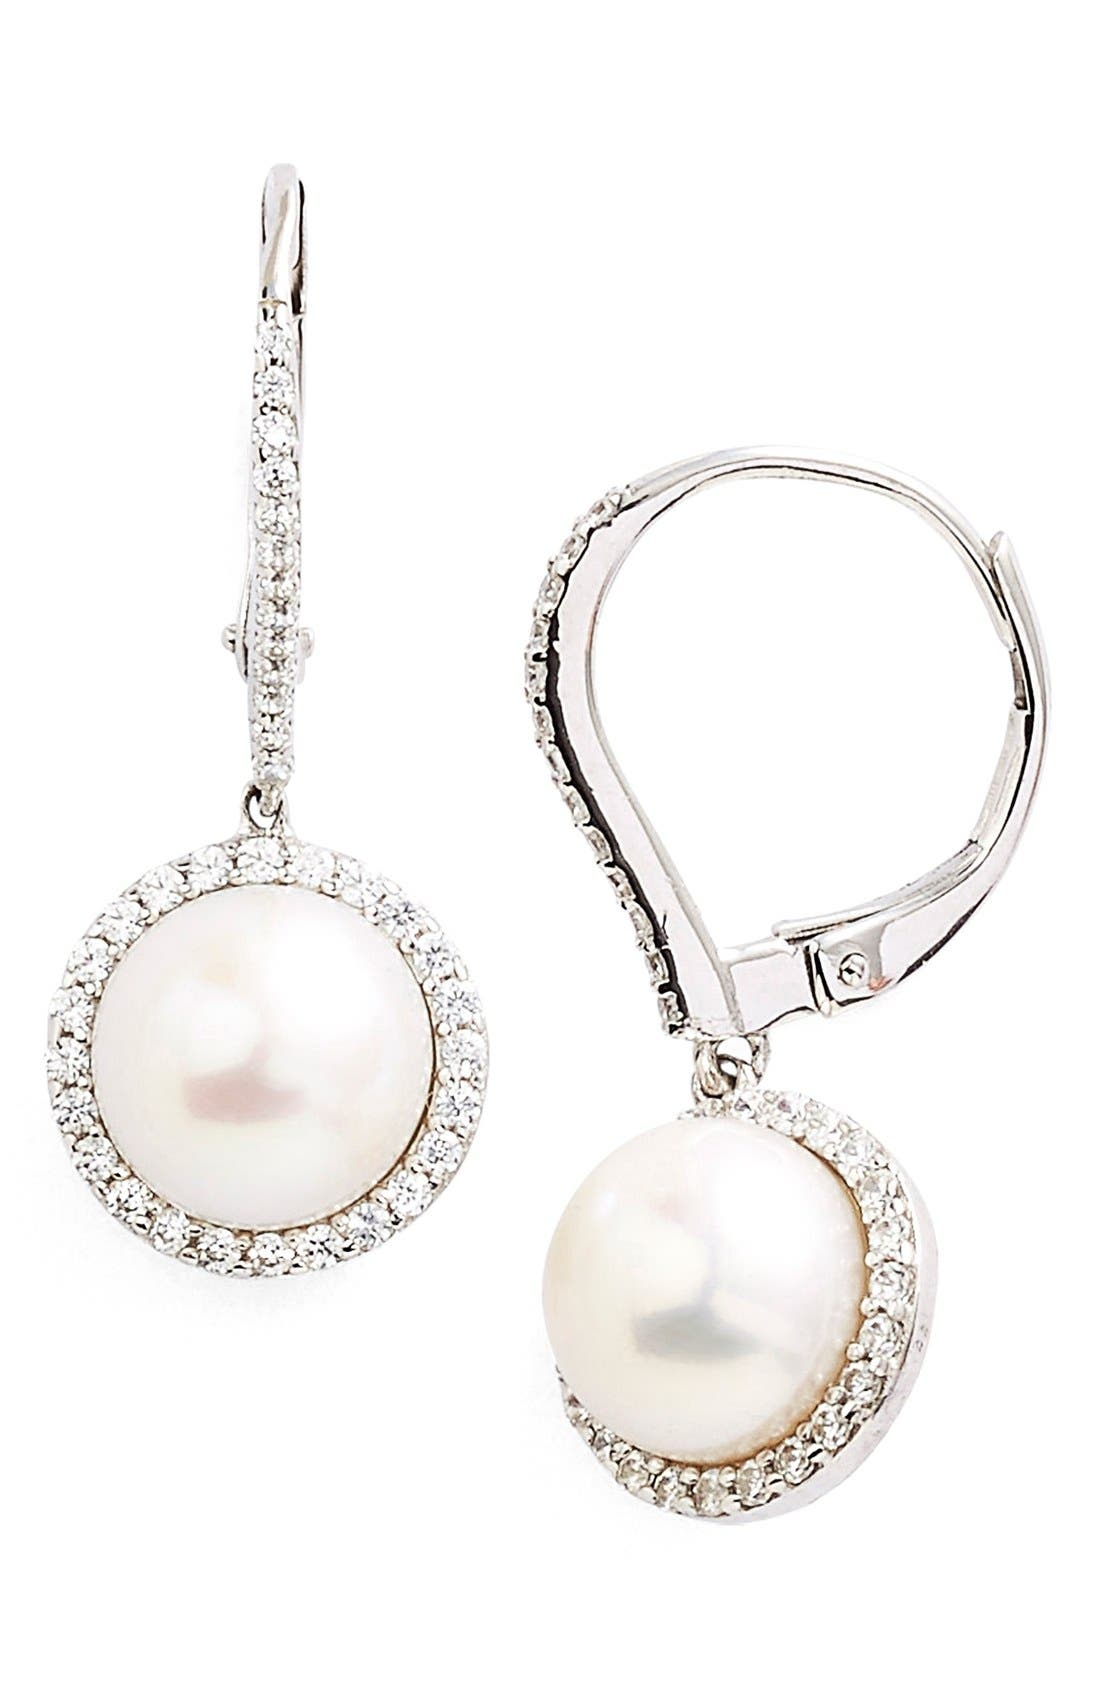 Main Image - Lafonn'Lassaire' Pearl Drop Earrings